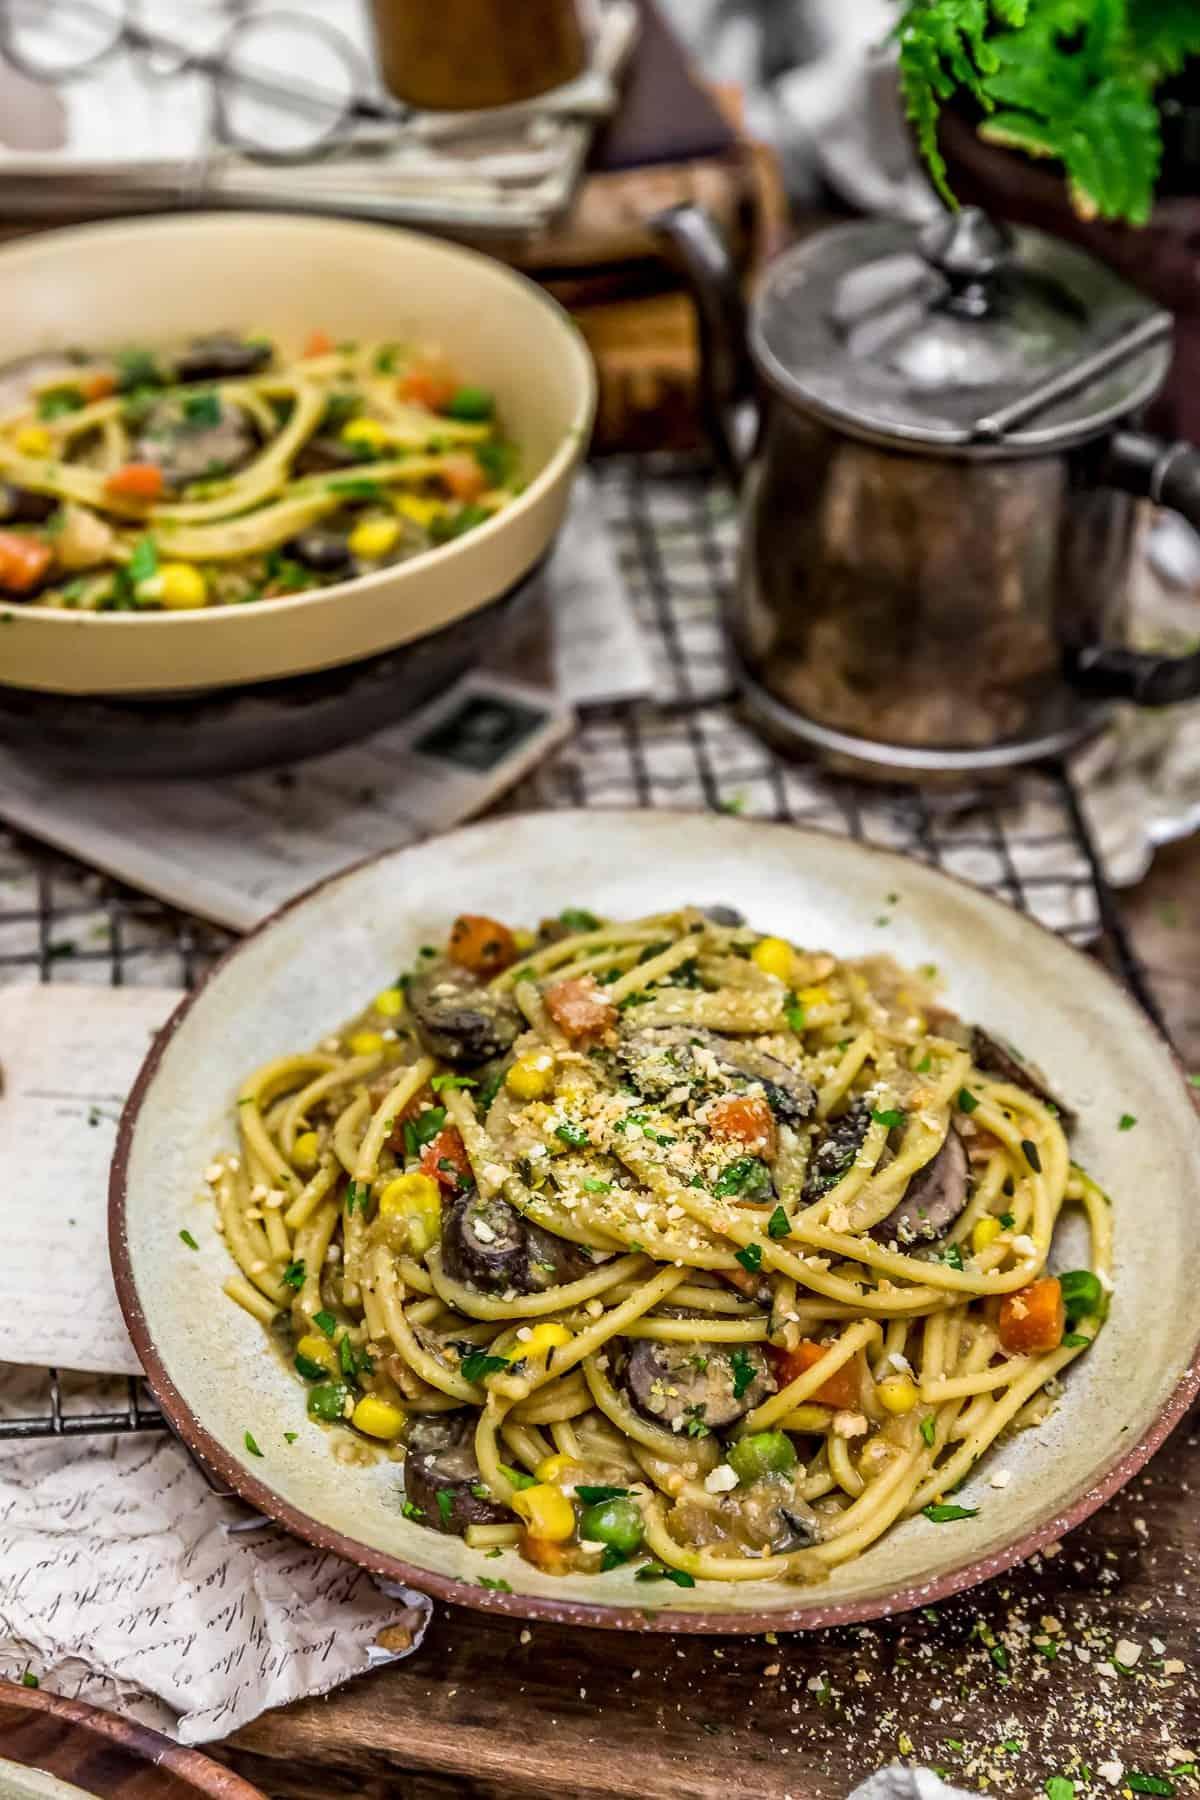 Plate and bowl of Vegan Veggie Tetrazzini